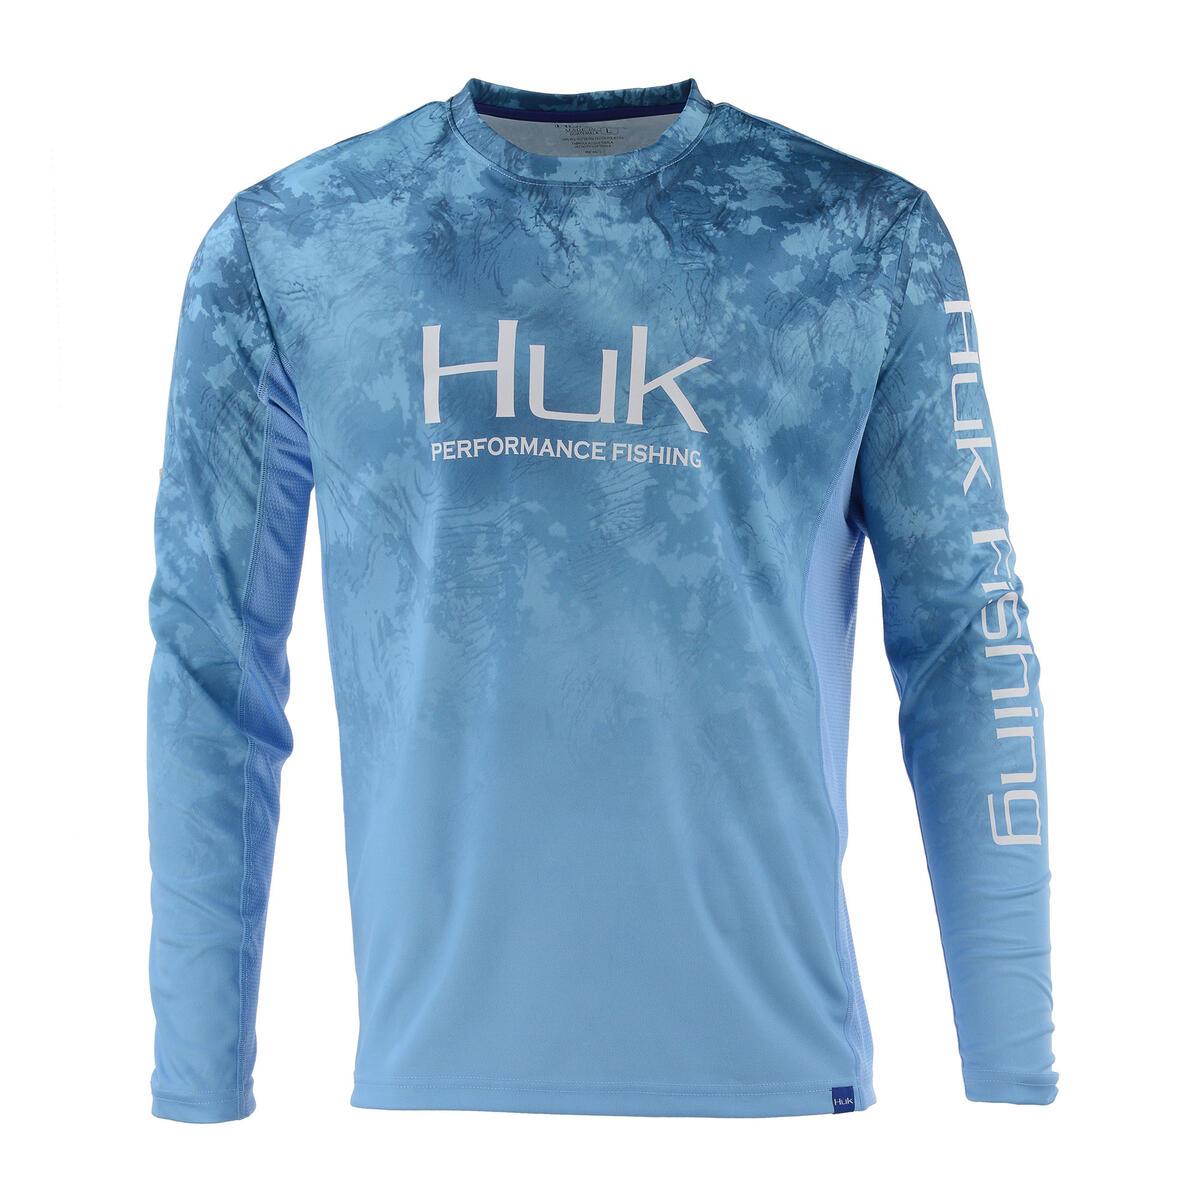 huk men 39 s huk icon camo fade long sleeve t shirt sun ski sports. Black Bedroom Furniture Sets. Home Design Ideas